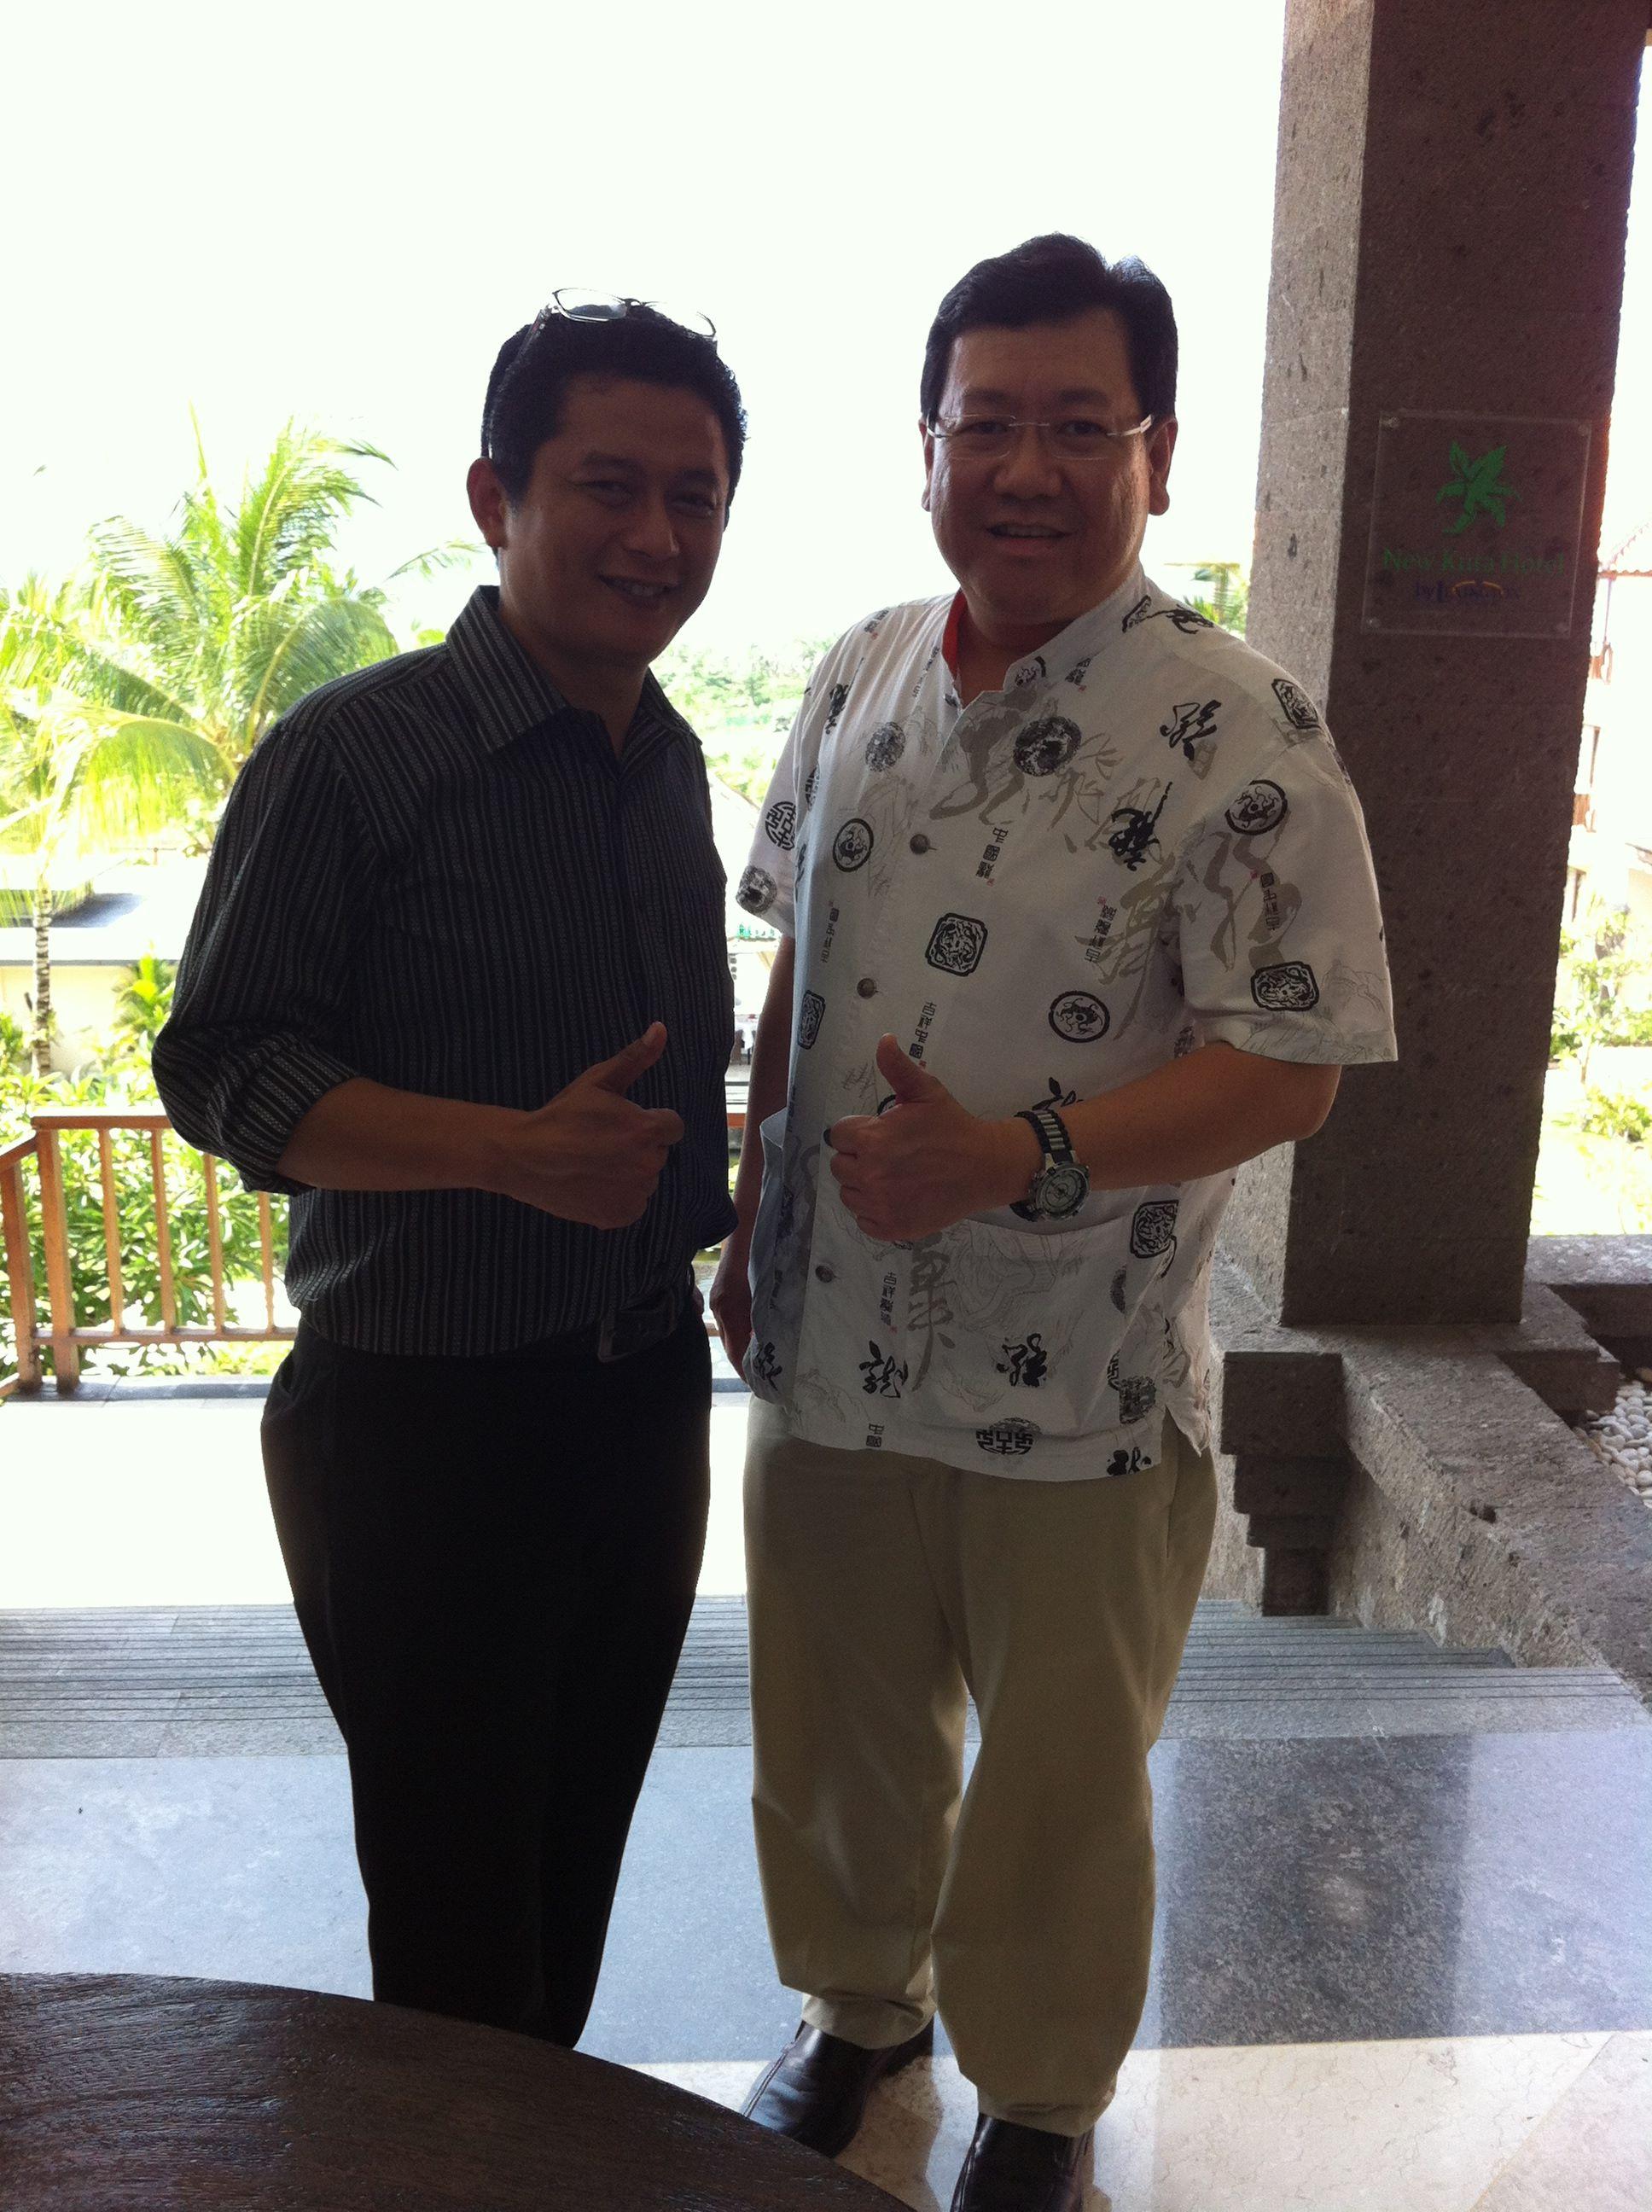 Feng Shui Koh Djohar Koh Dan Izur Muchtar Event Lg Denpasar